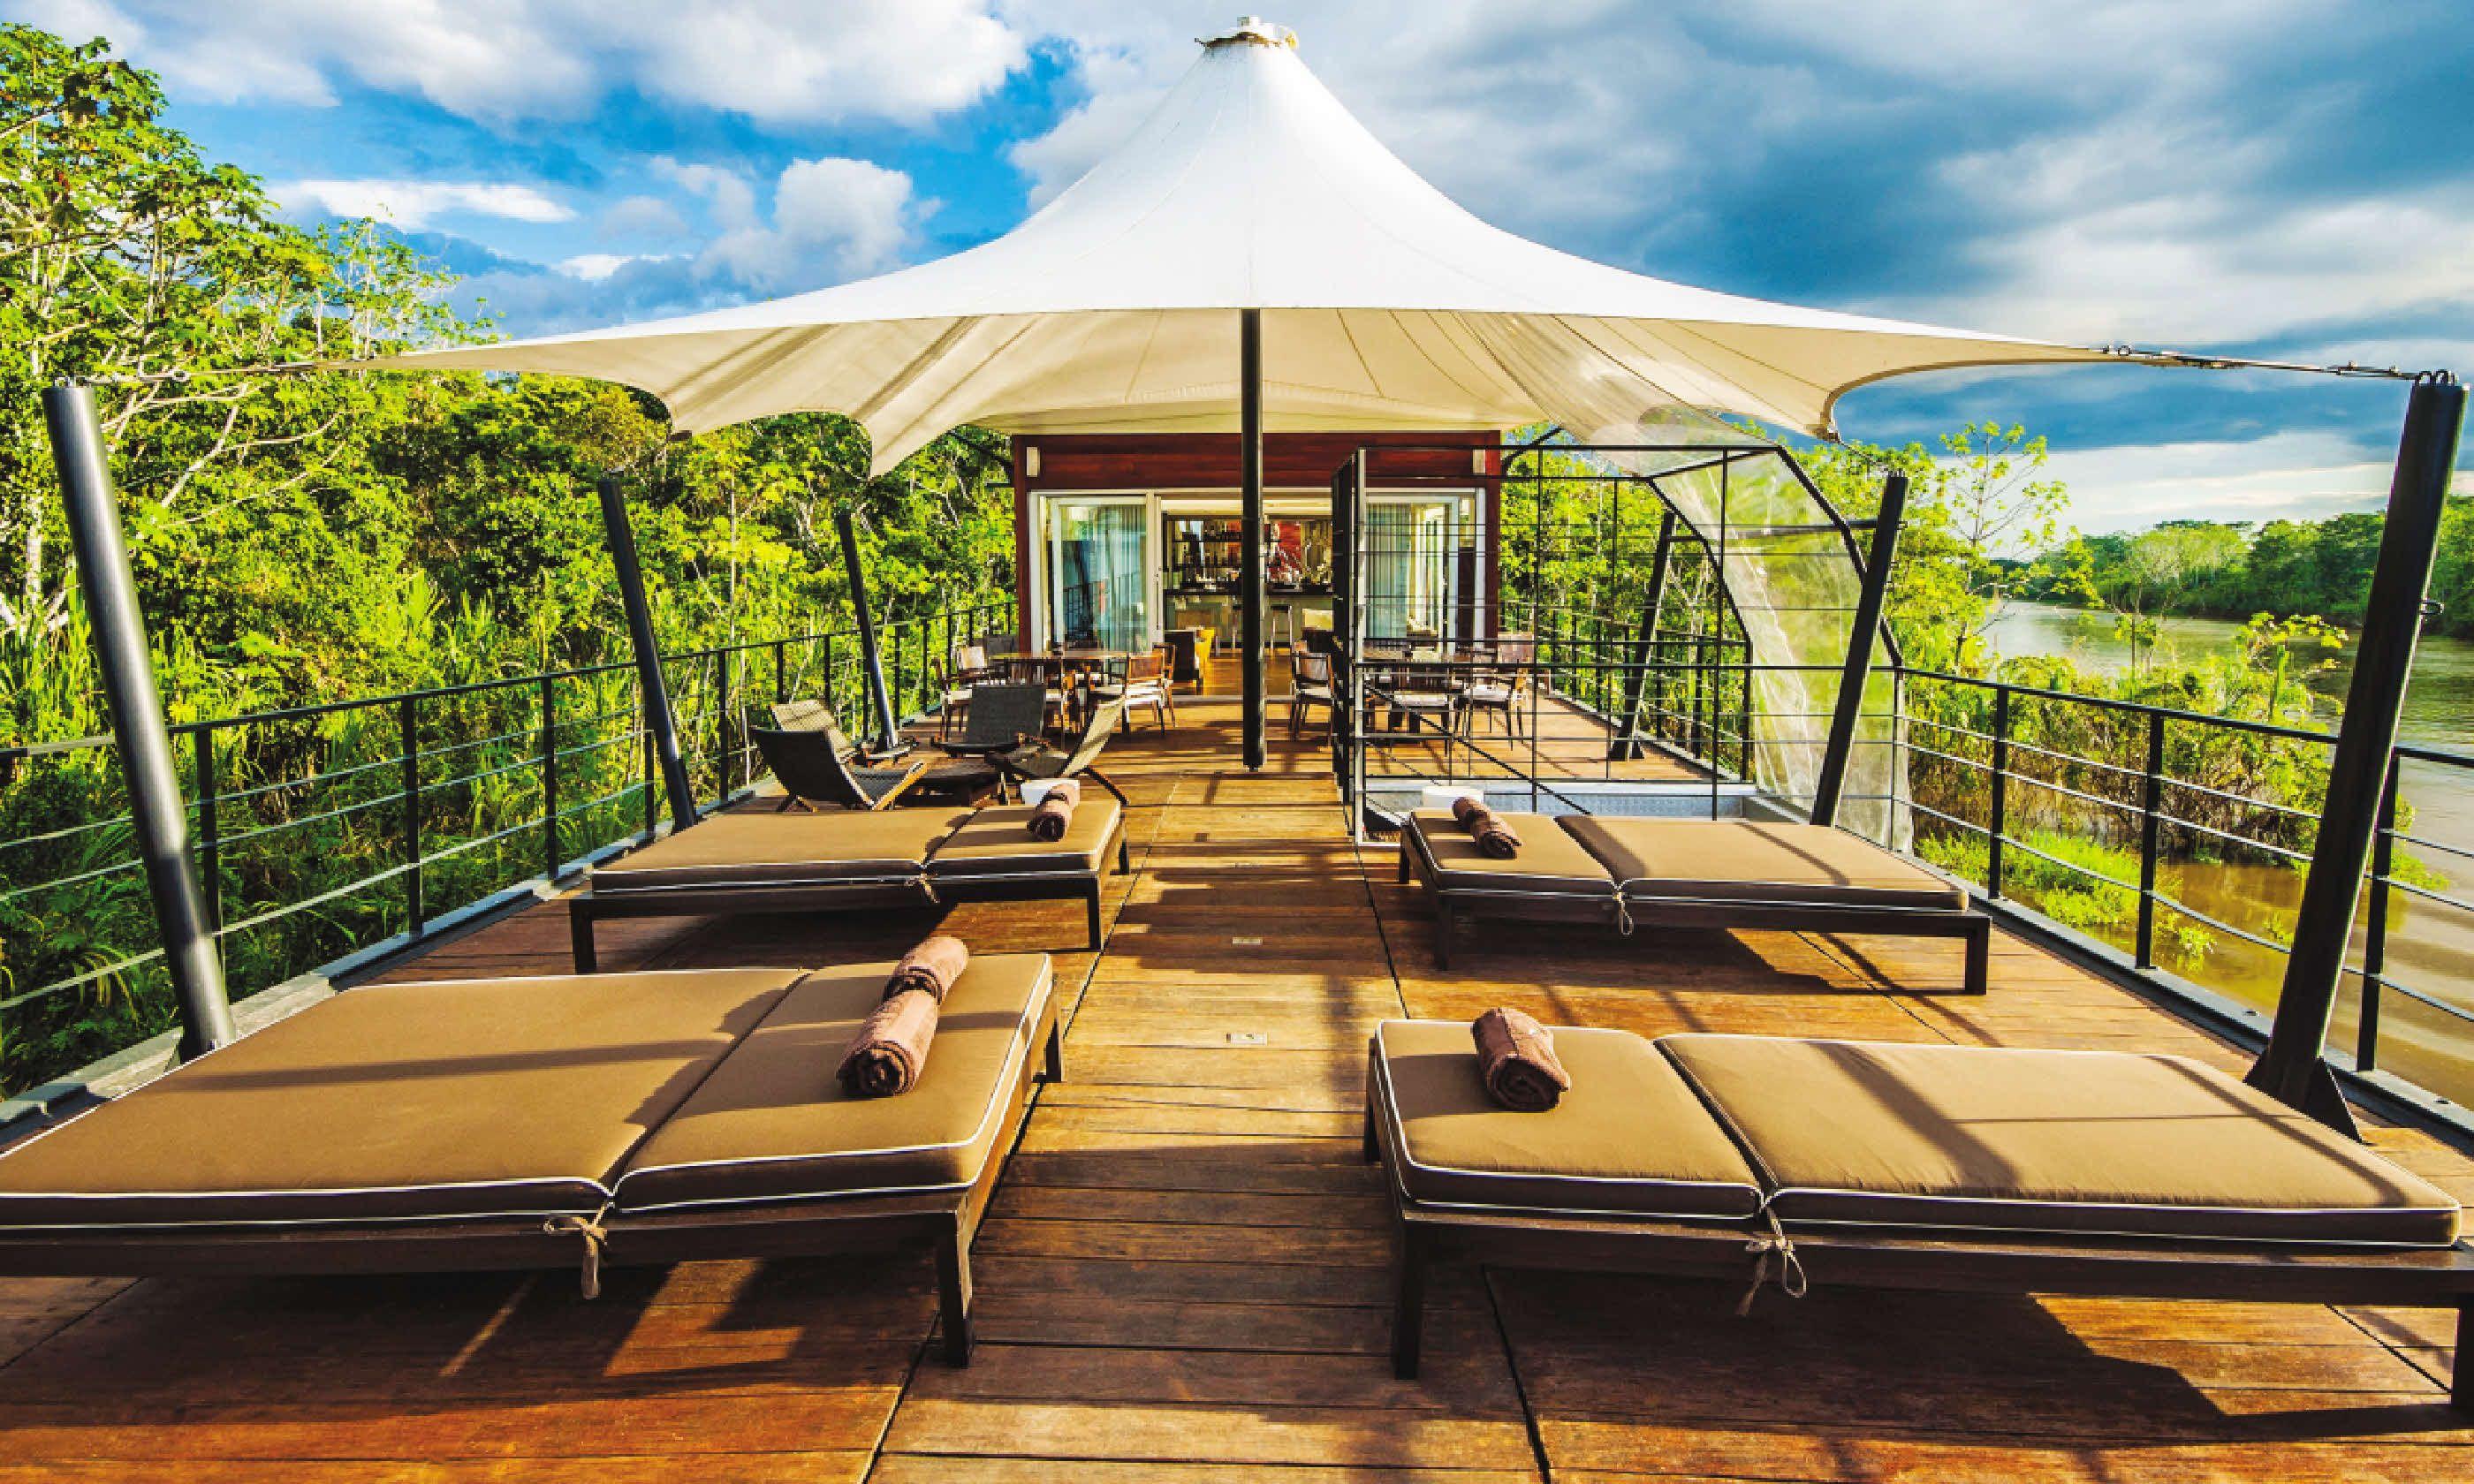 Aqua Amazon Outdoor Lounge